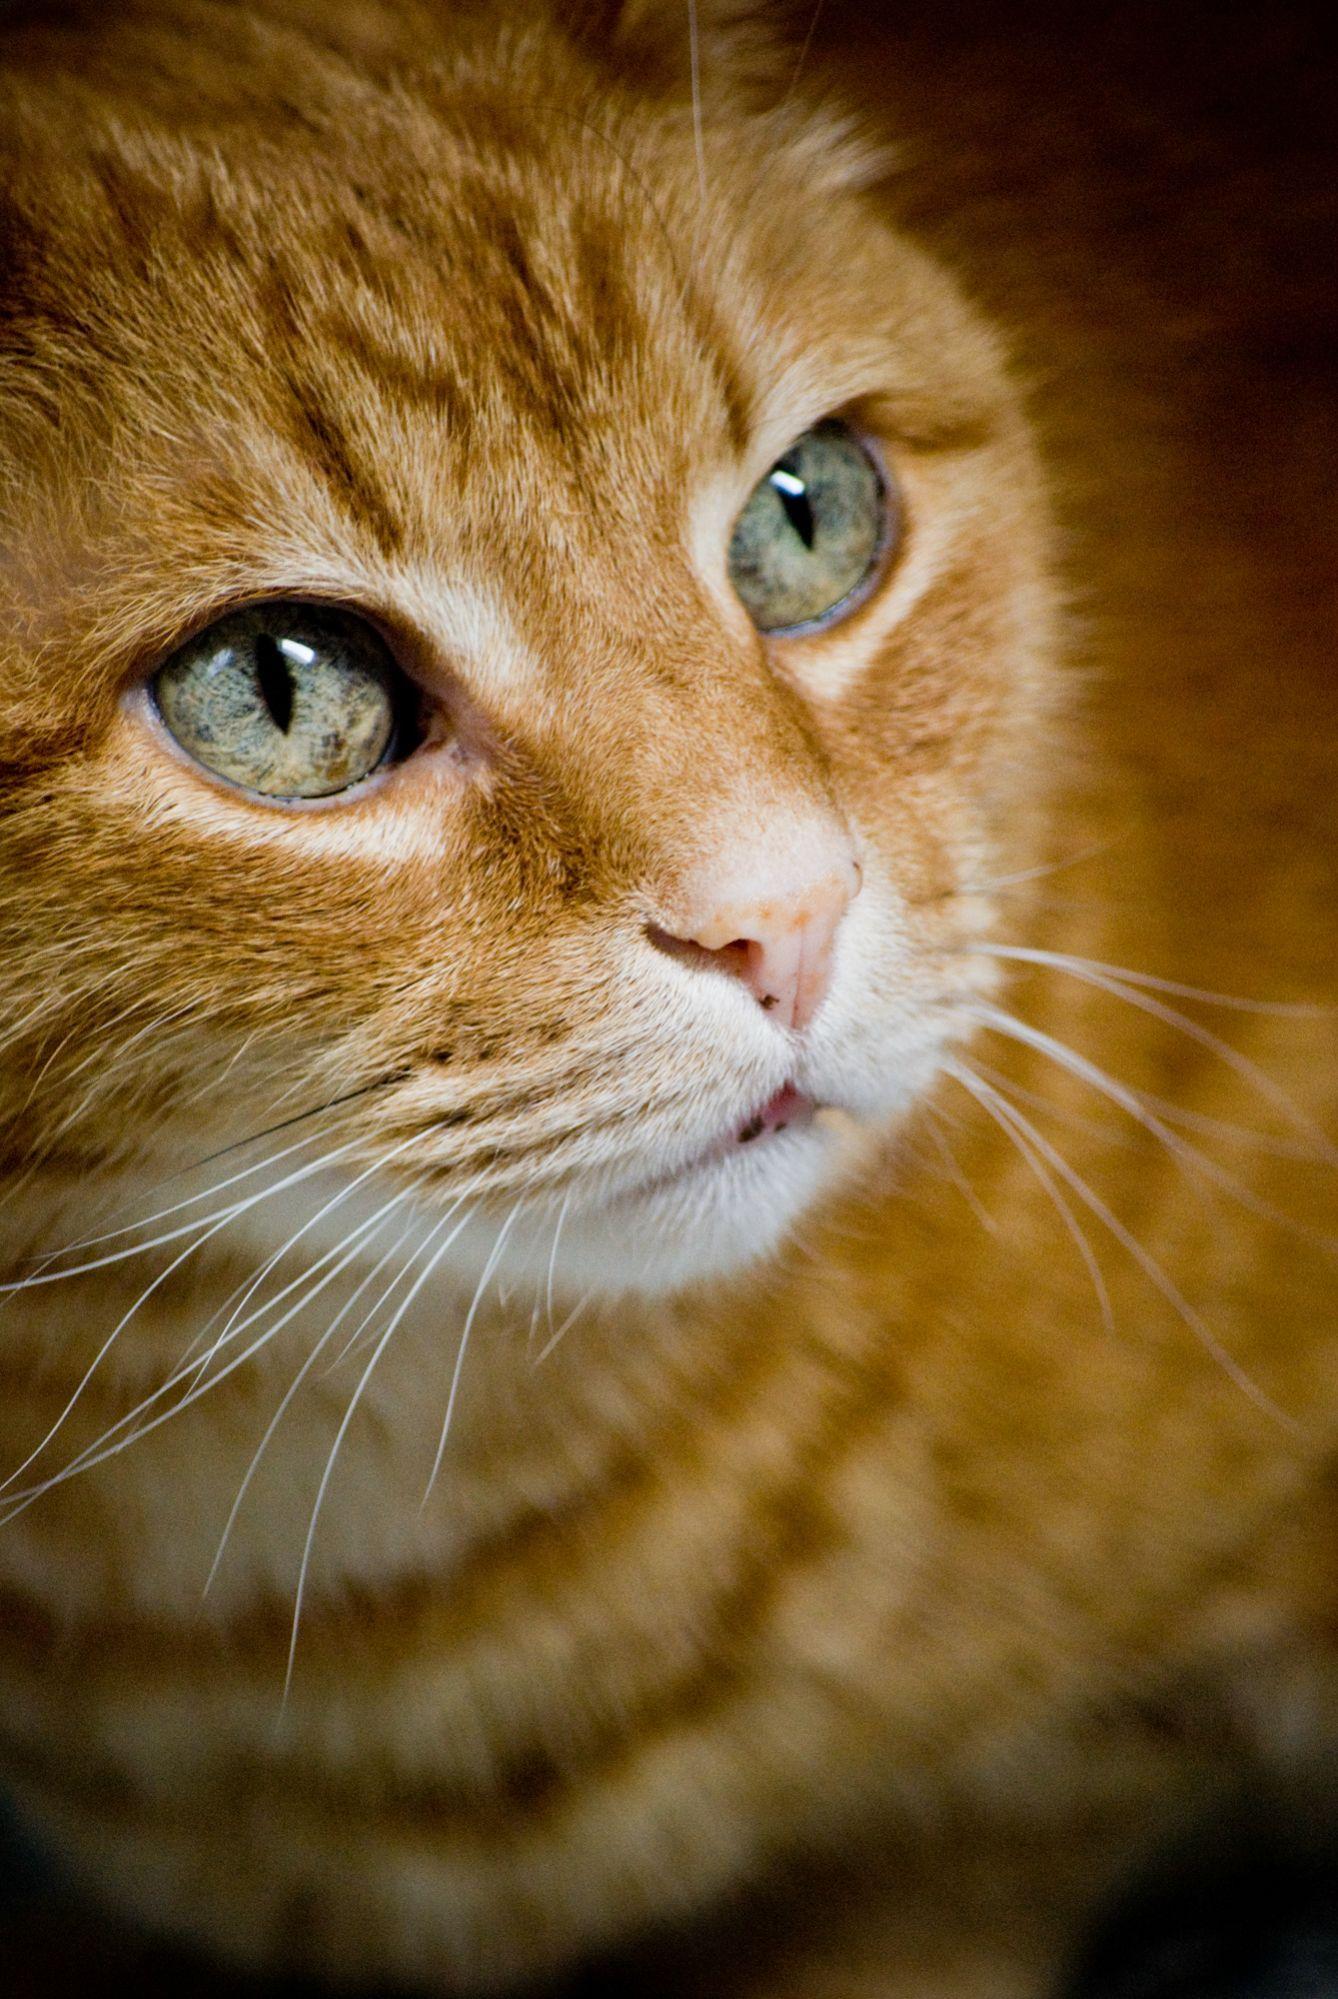 Best Photo I Ever Got Of My Cat Orange Tabby Cats Orange Cats Beautiful Cats